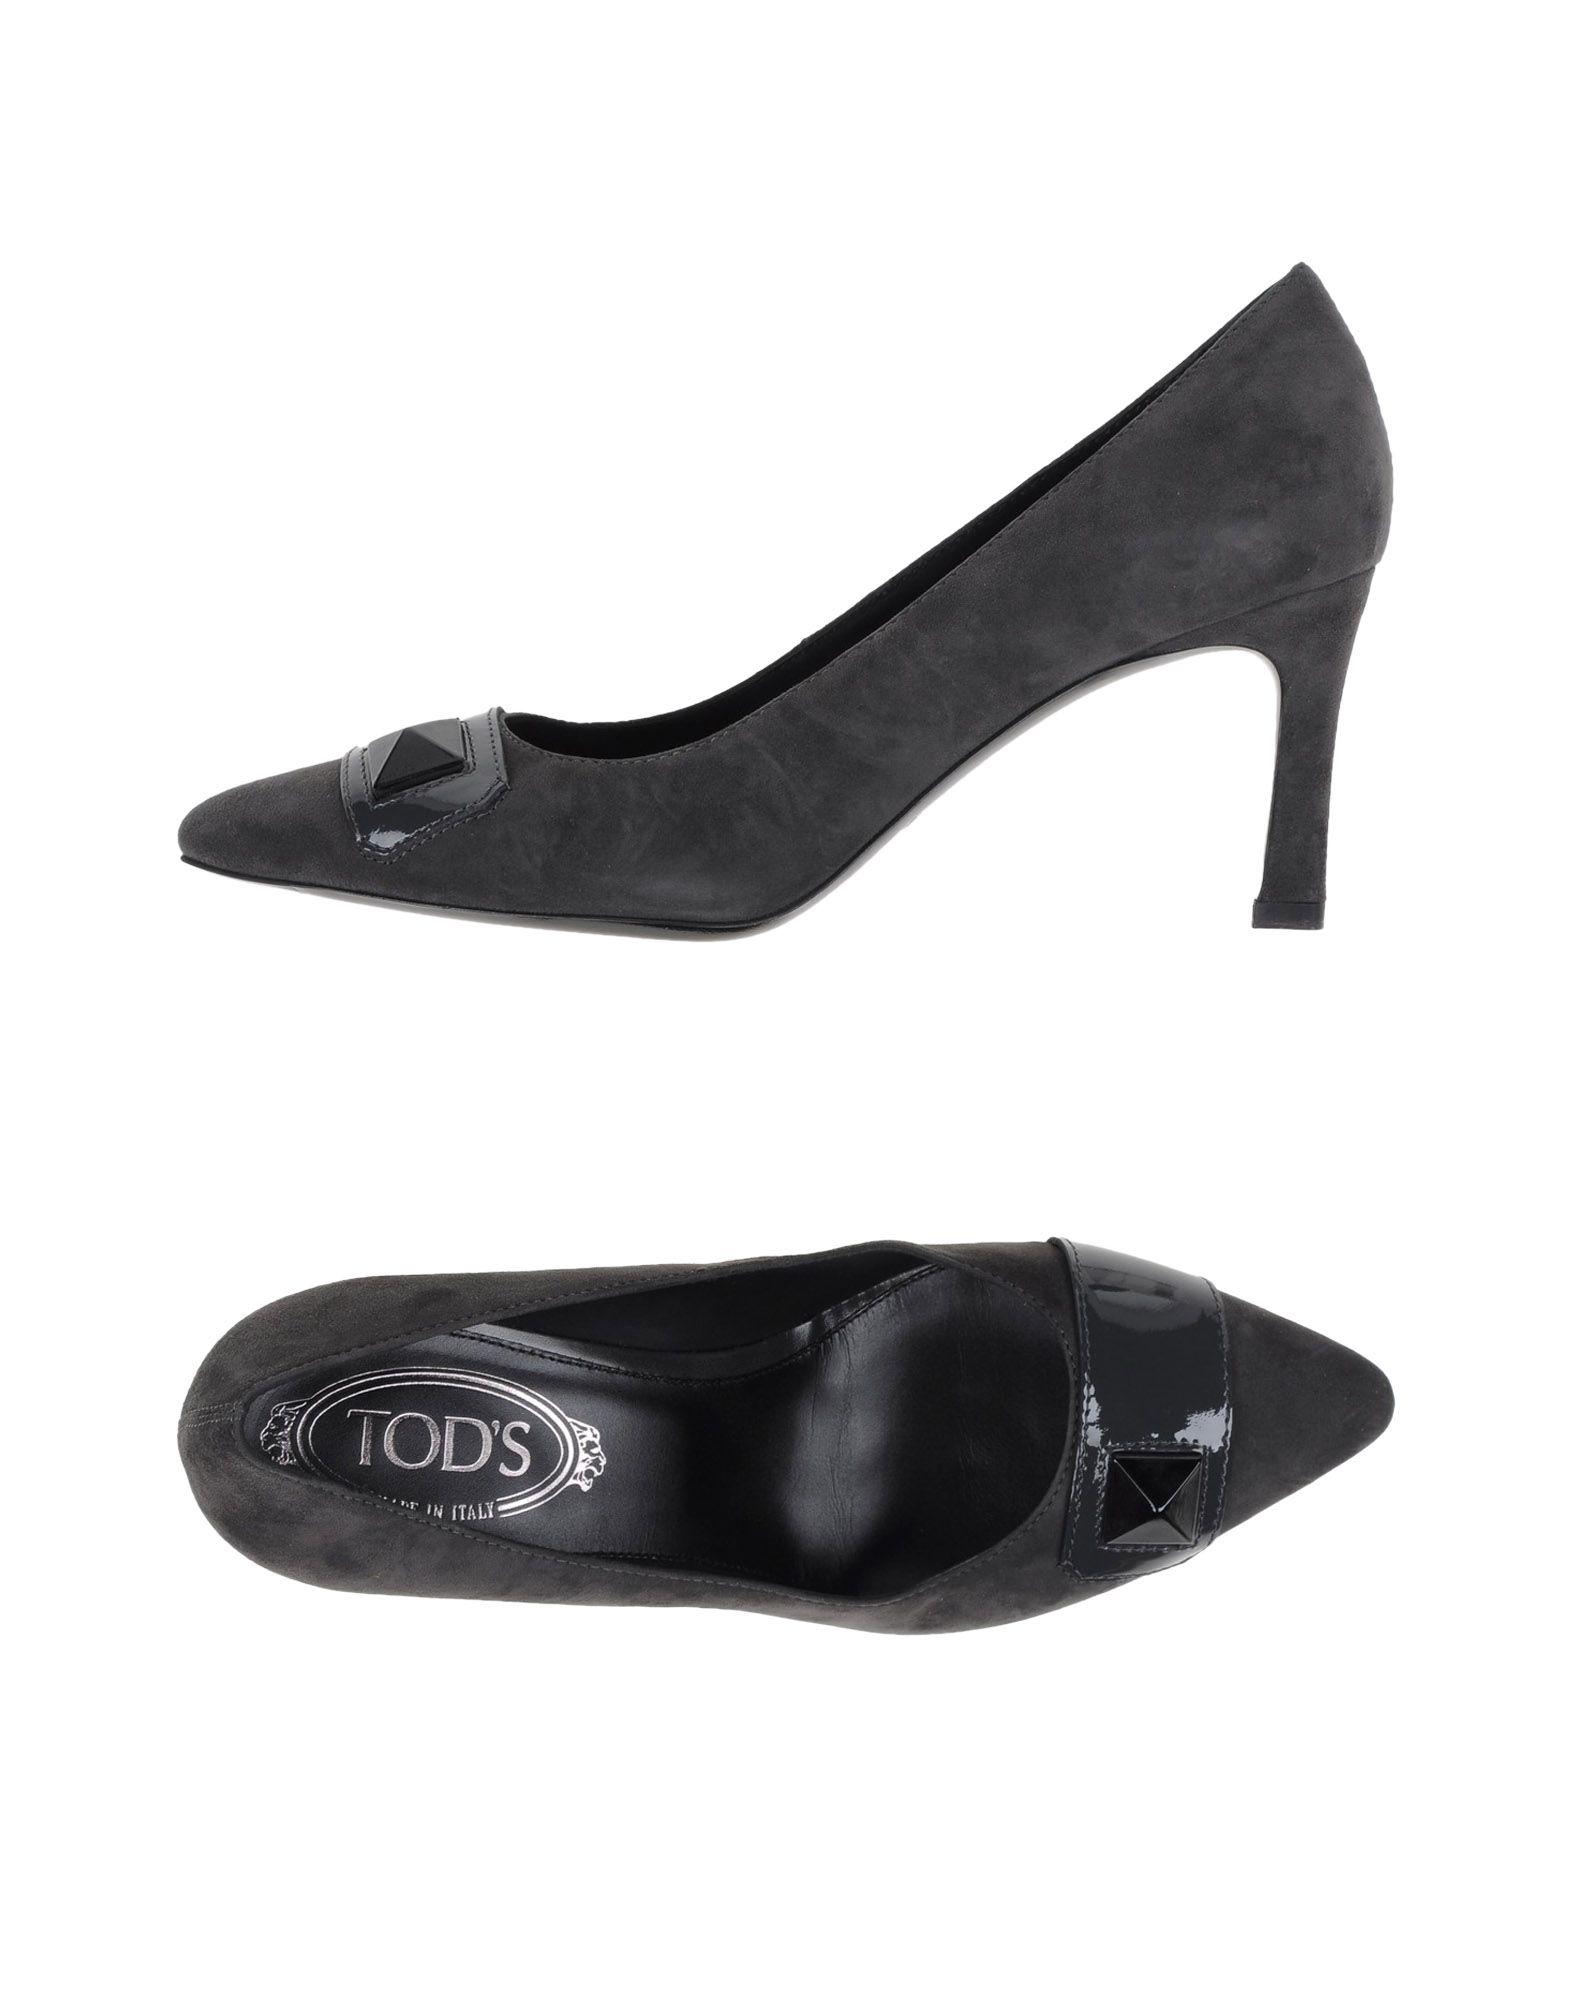 Haltbare Mode billige Schuhe Tod's Pumps Damen  11016948AX Heiße Schuhe